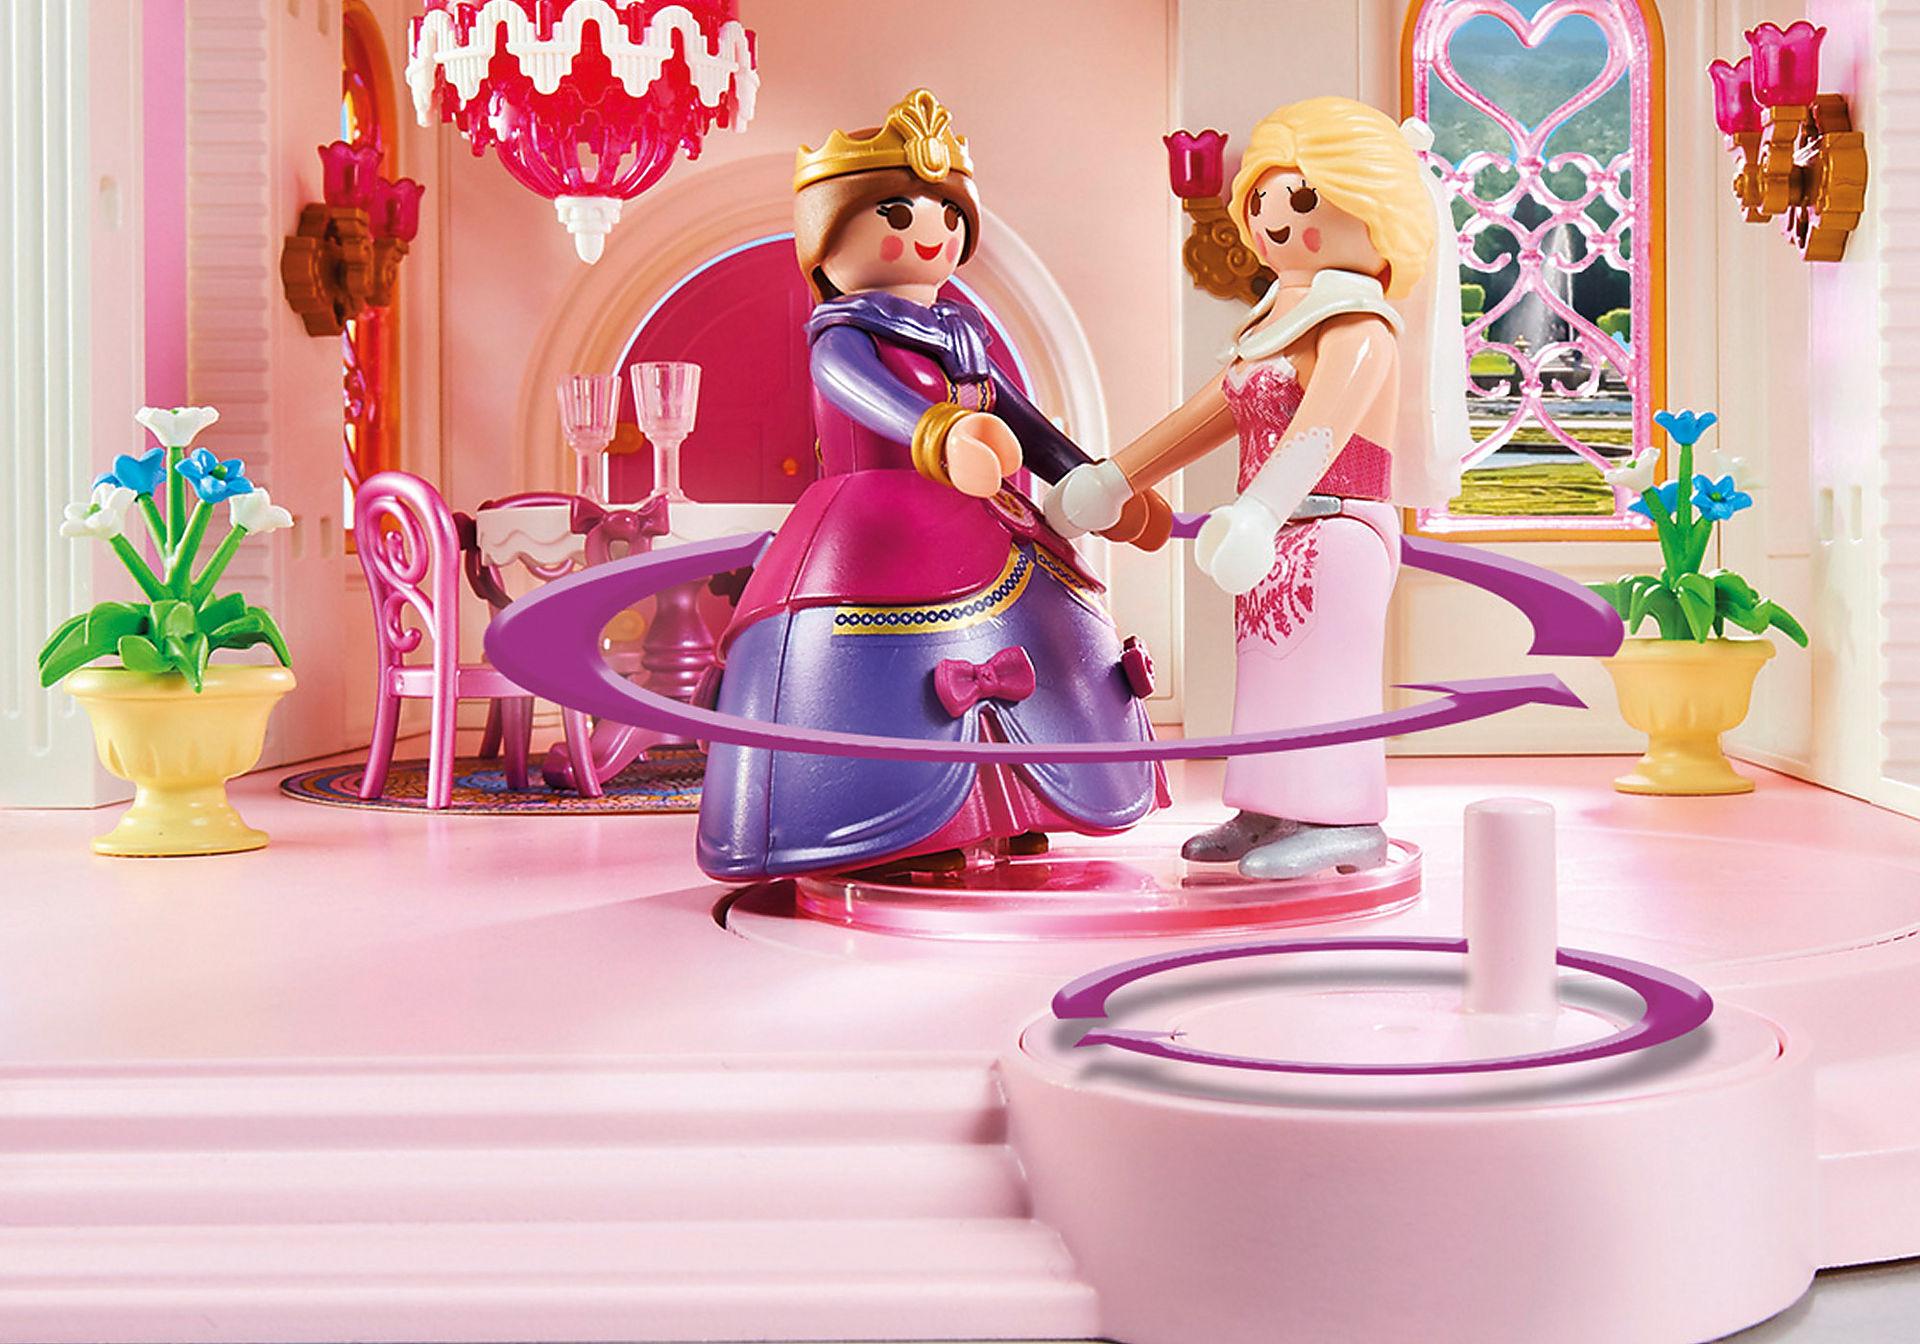 70447 Large Princess Castle zoom image9